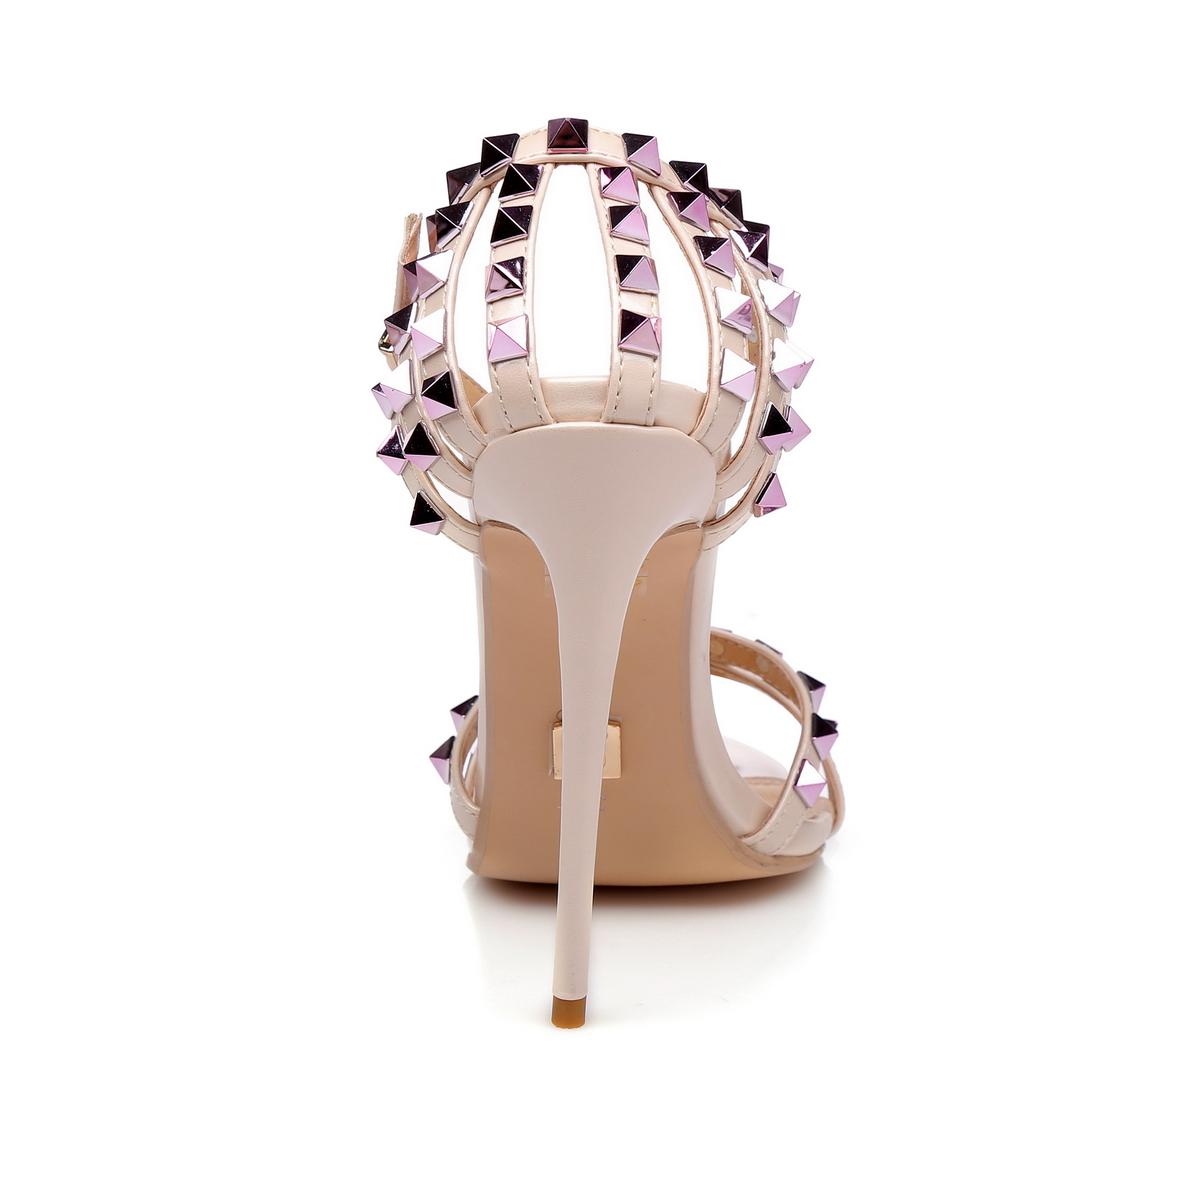 GIARO - Damen High Heel Sandalatten - Hautfarbend Schuhe in Übergrößen – Bild 3